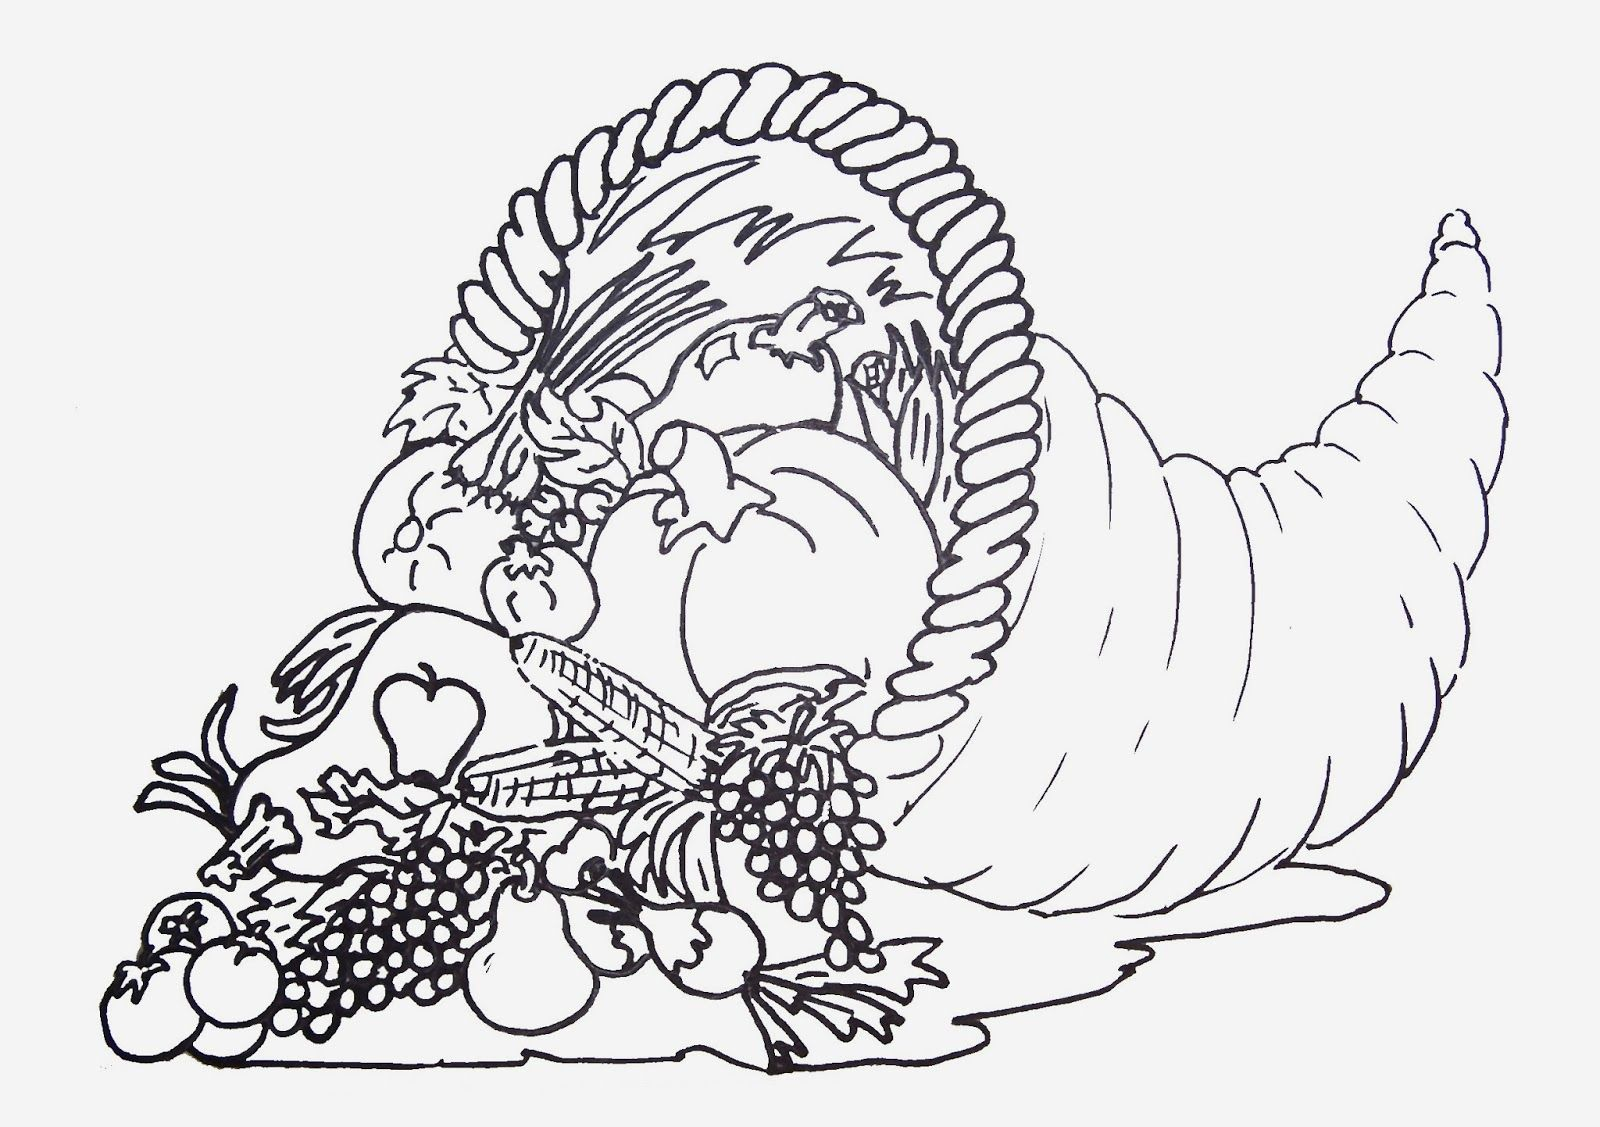 Uncategorized Thanksgiving Cornucopia Coloring Pages thanksgiving cornucopia coloring pages e halloween arts arts